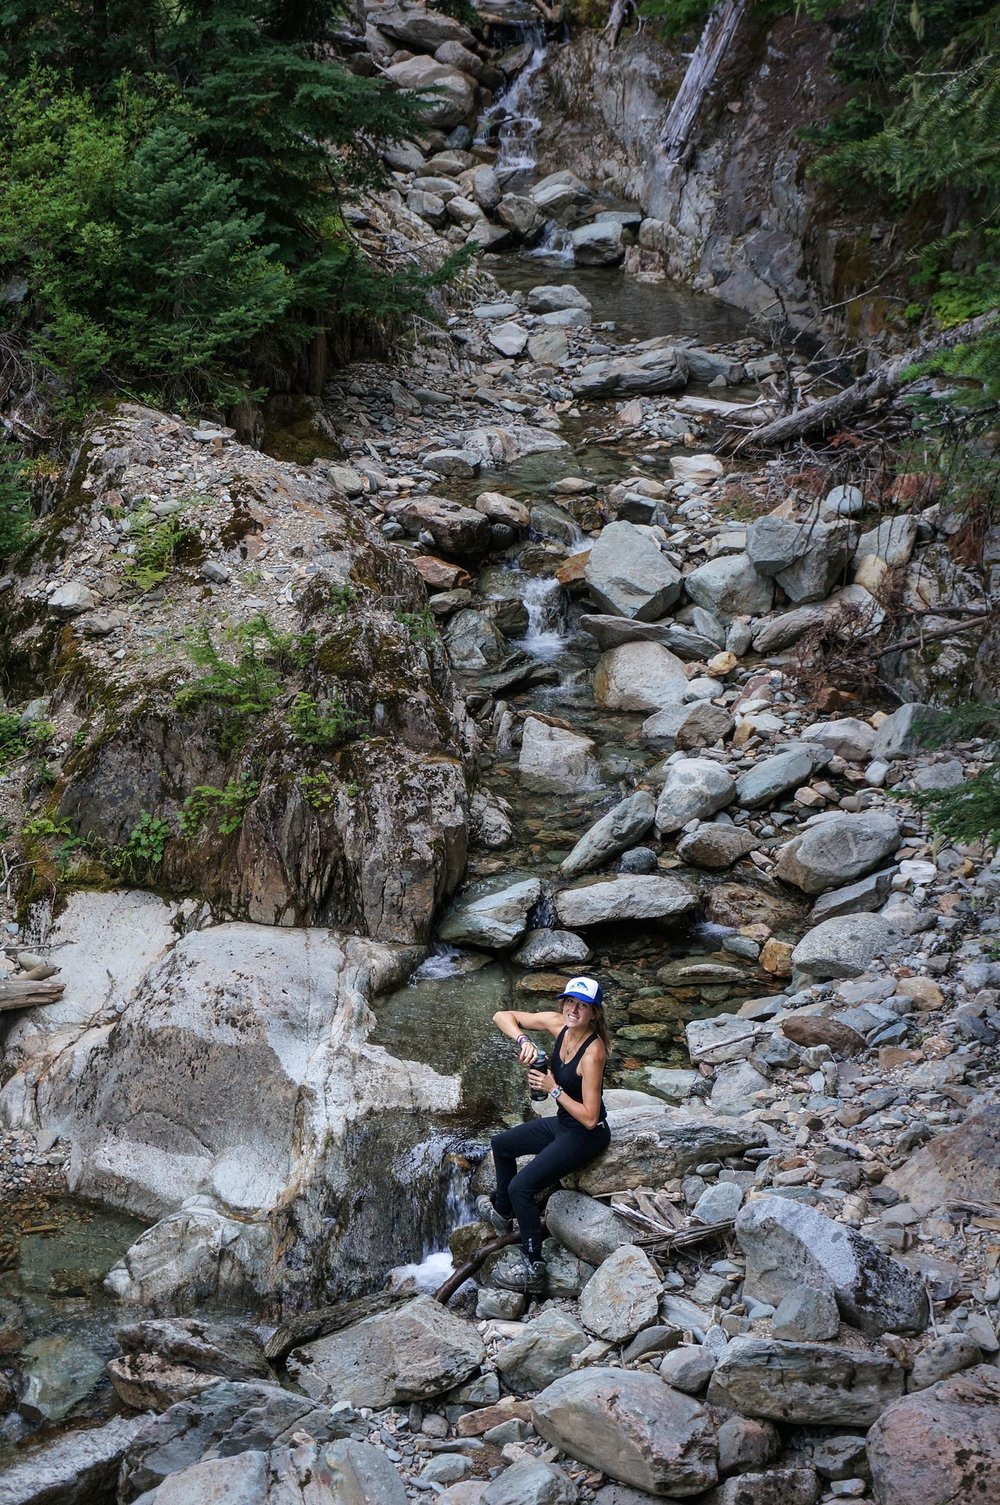 sproatt_alpine_trail_candice_river_rocks.jpg